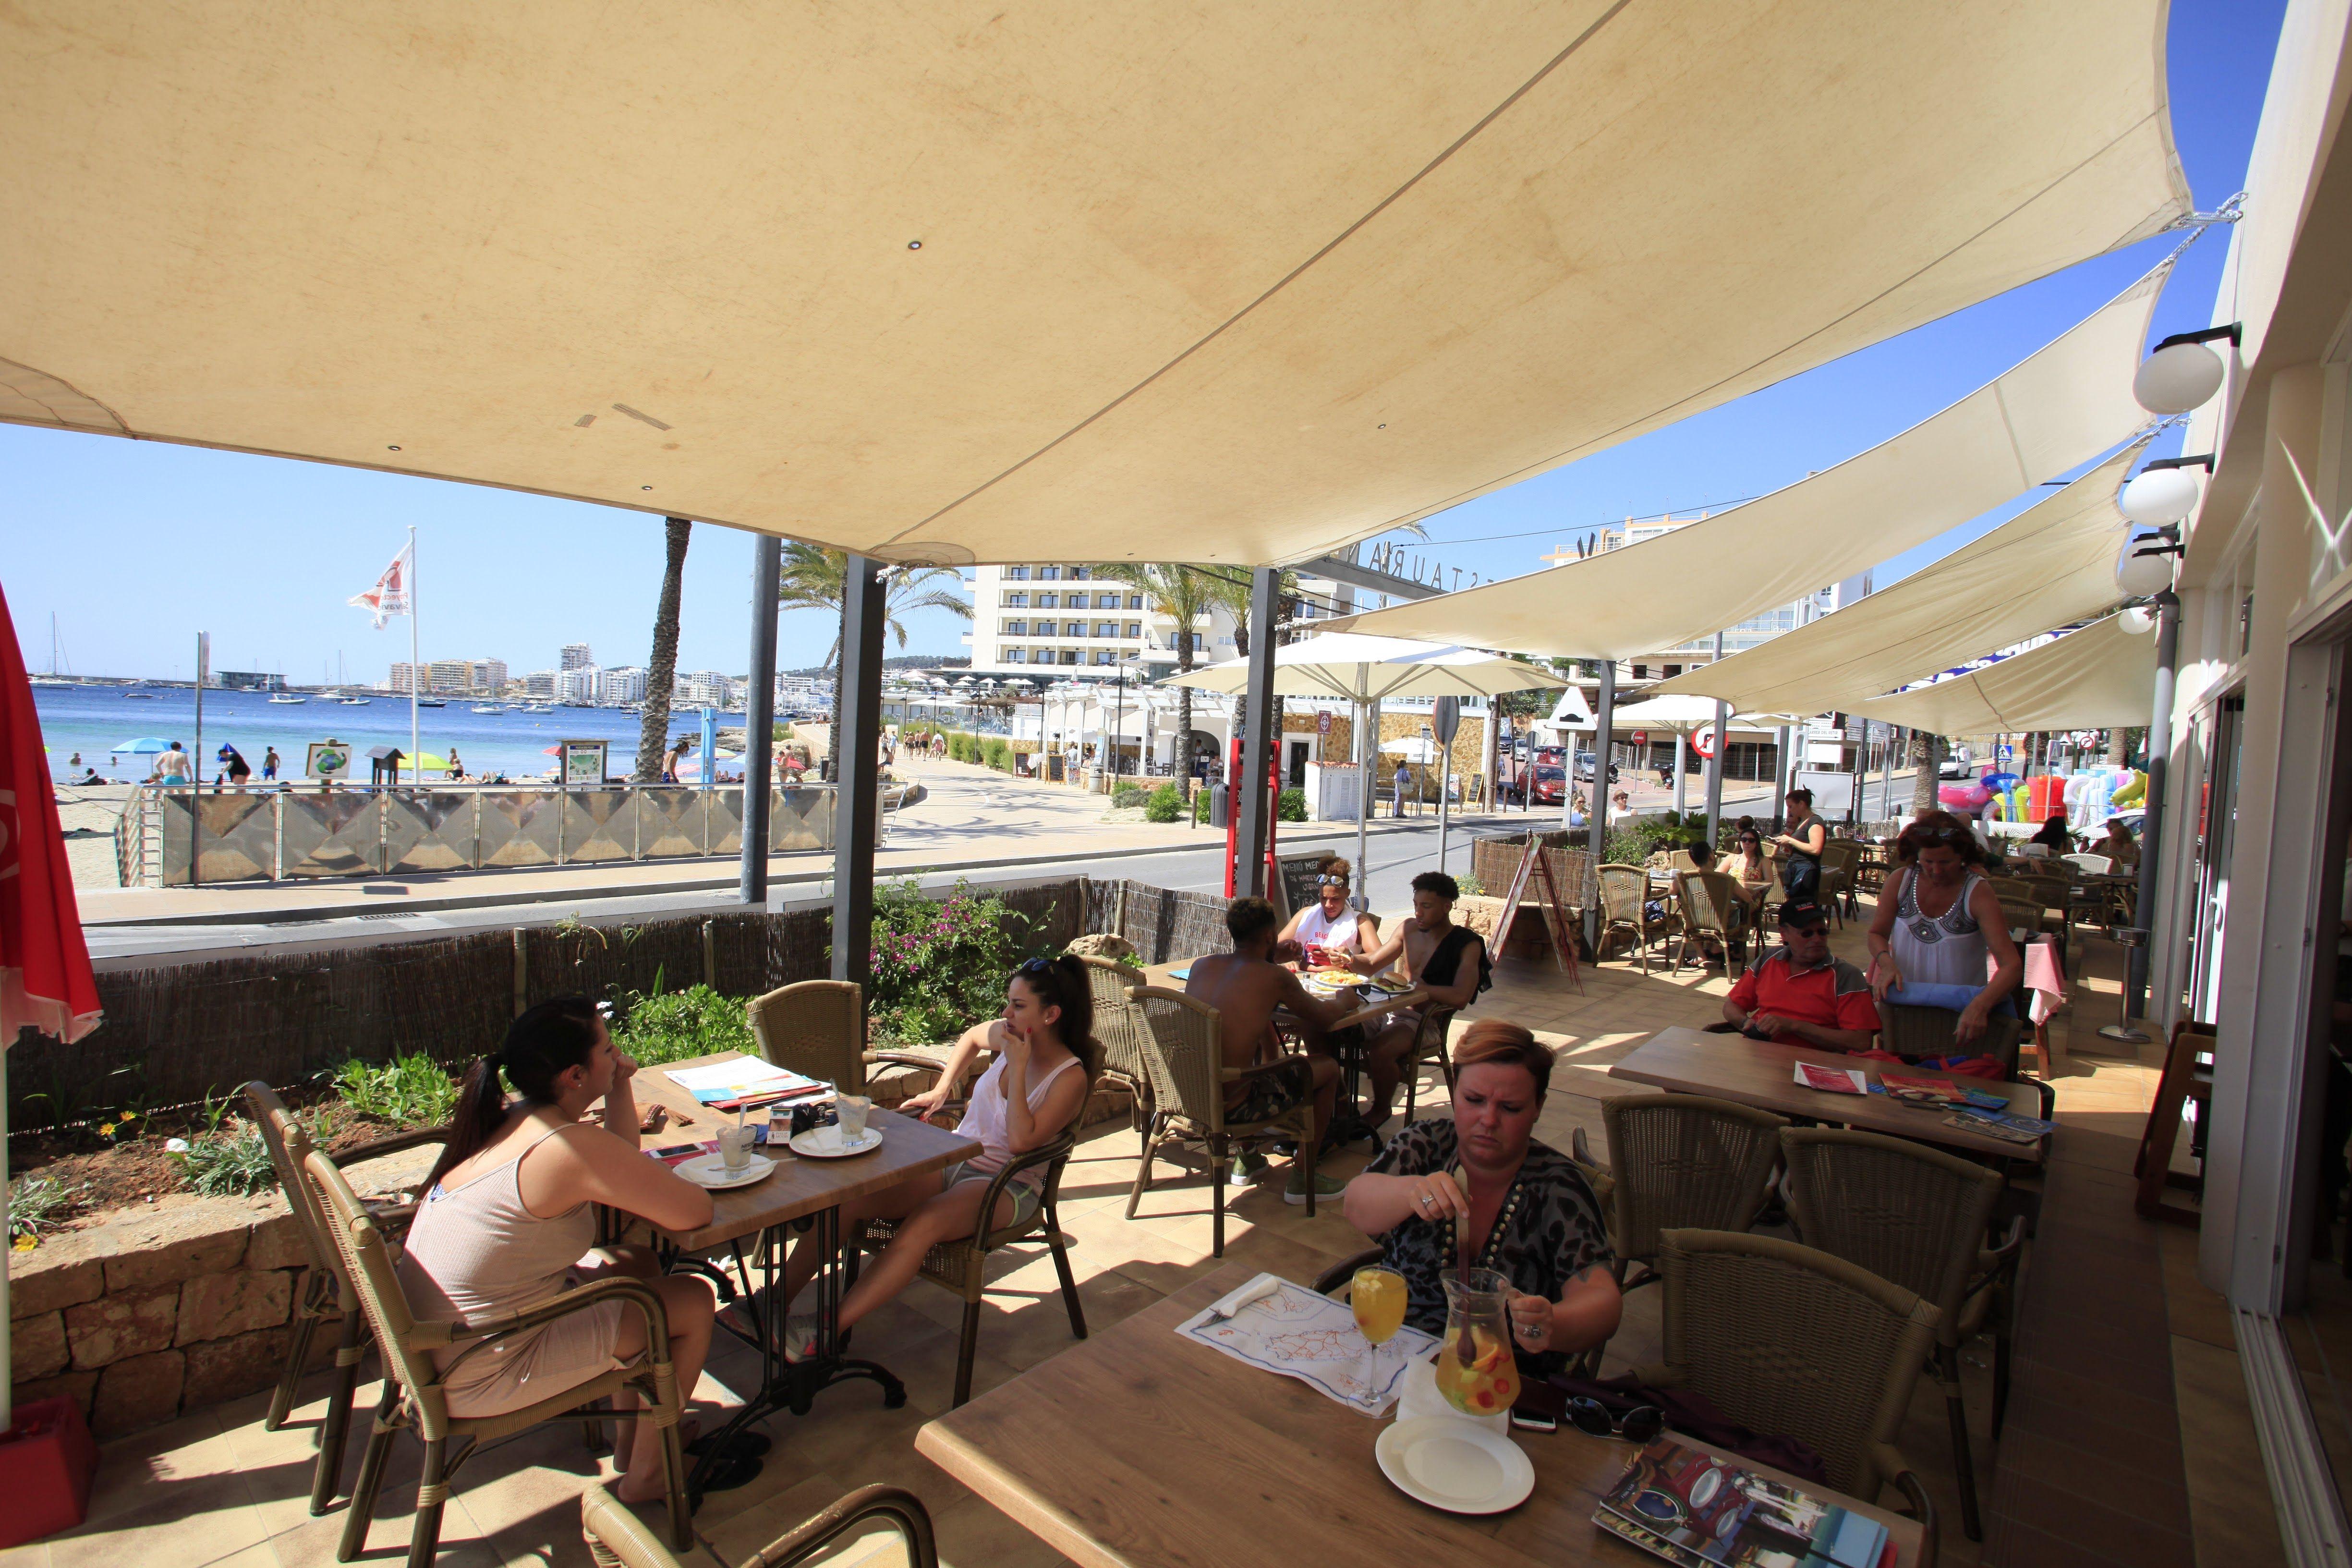 Foto 1 de Restaurante en Sant Antoni de Portmany | Restaurante Sa Punta D'es Moli